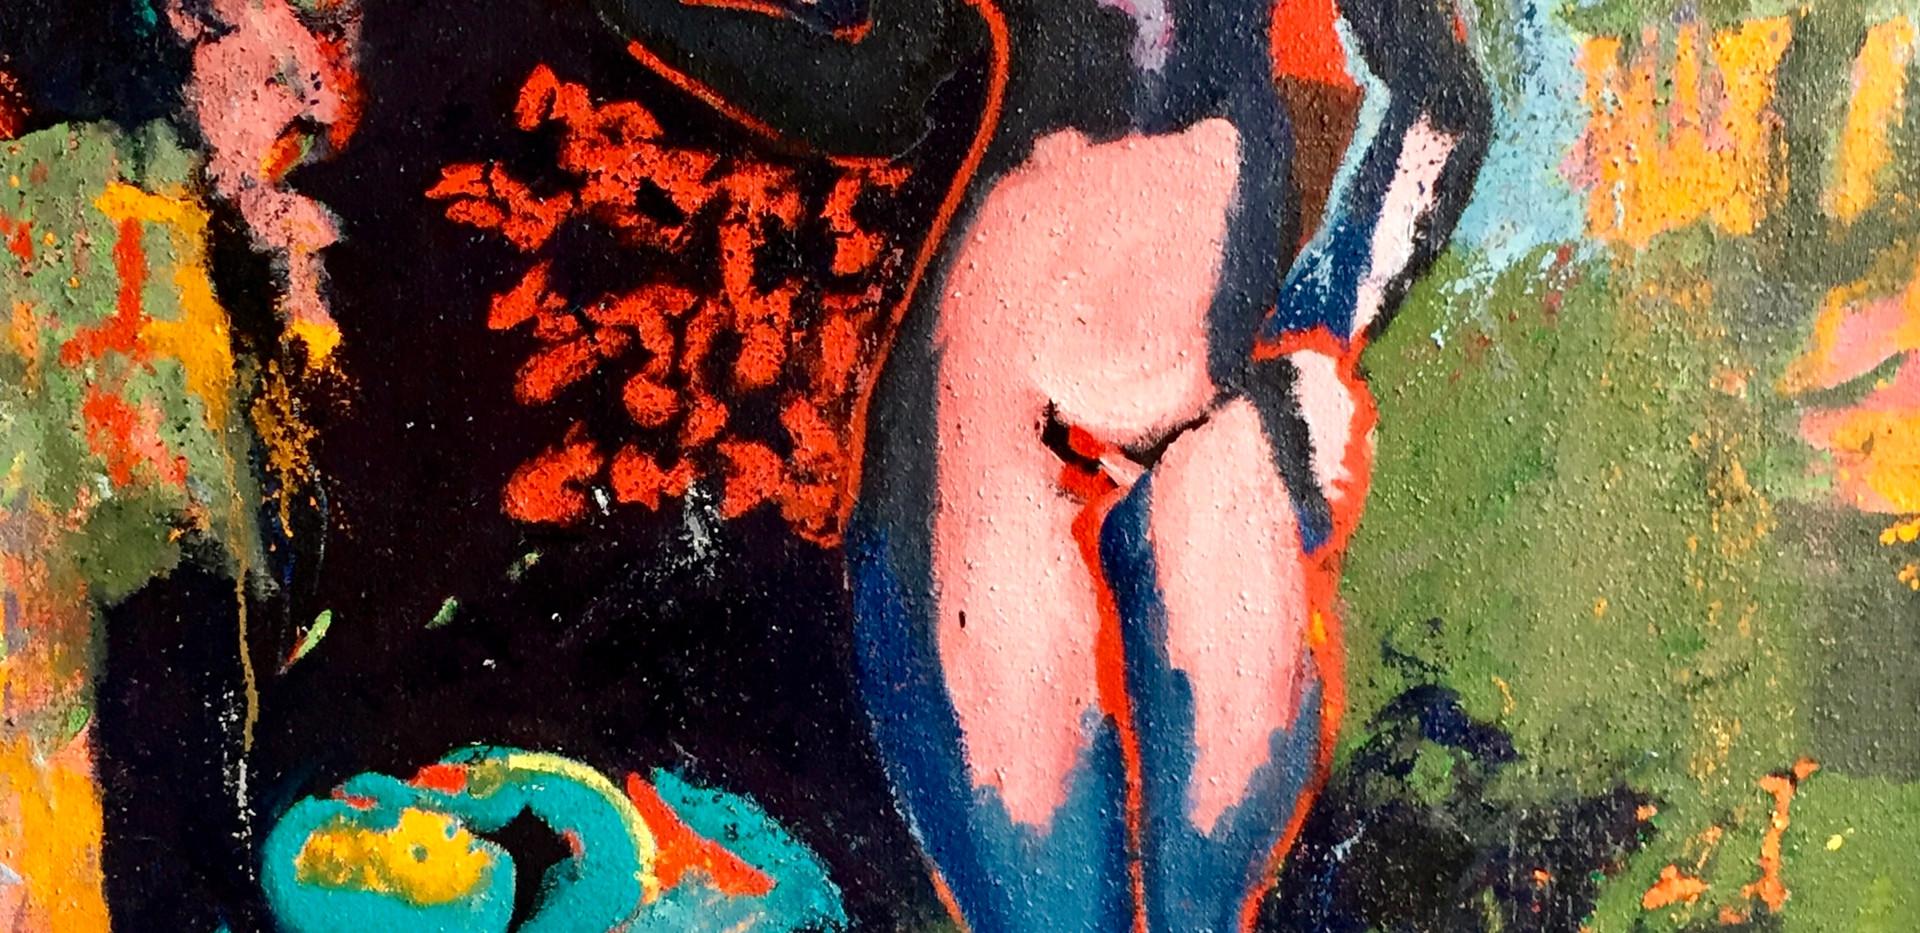 Lucas Cranach Kopie.jpg